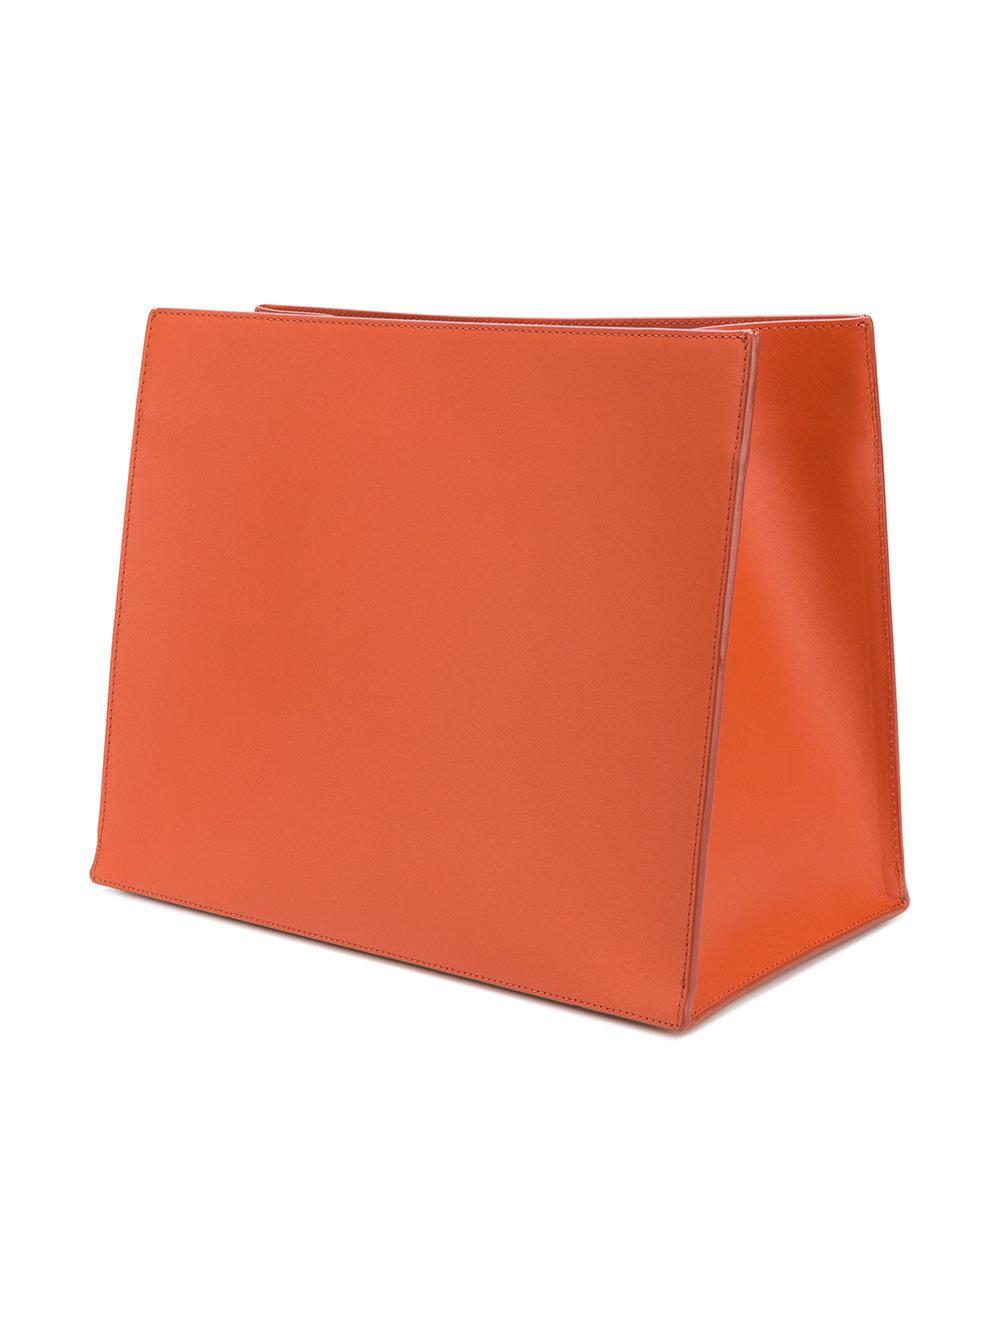 Danse Lente Leather Young Tote in Yellow & Orange (Orange)